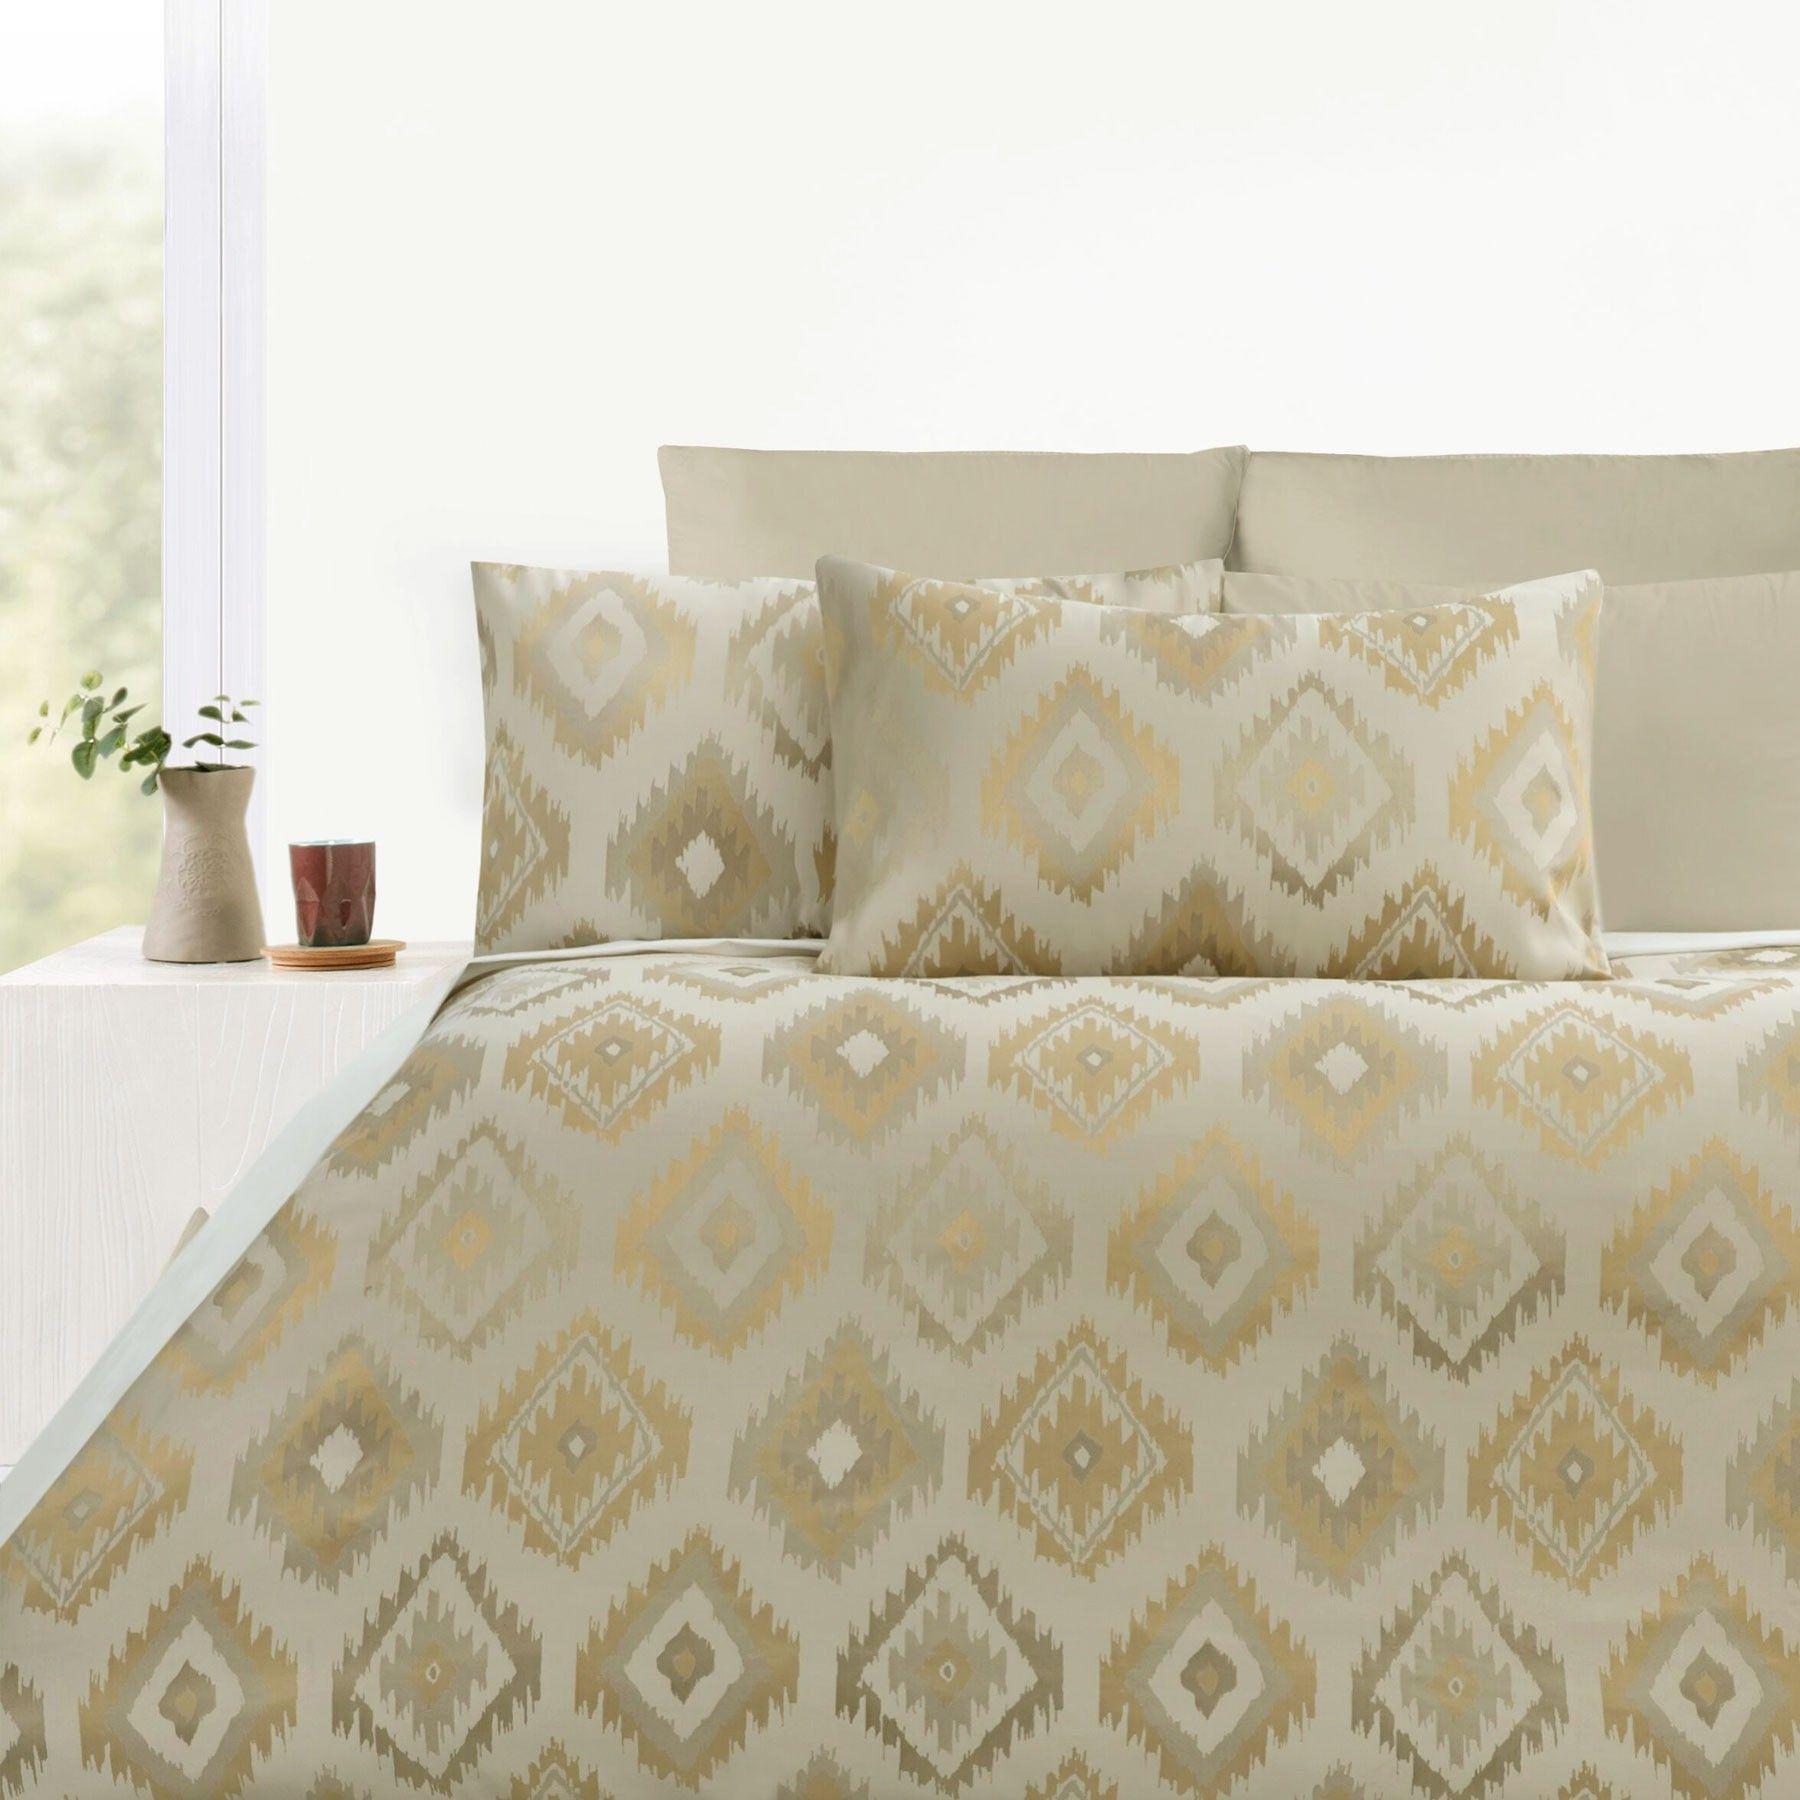 300TC Gold Geo Jacquard Quilt Cover Set by Accessorize | Quilt ... : jacquard quilt - Adamdwight.com